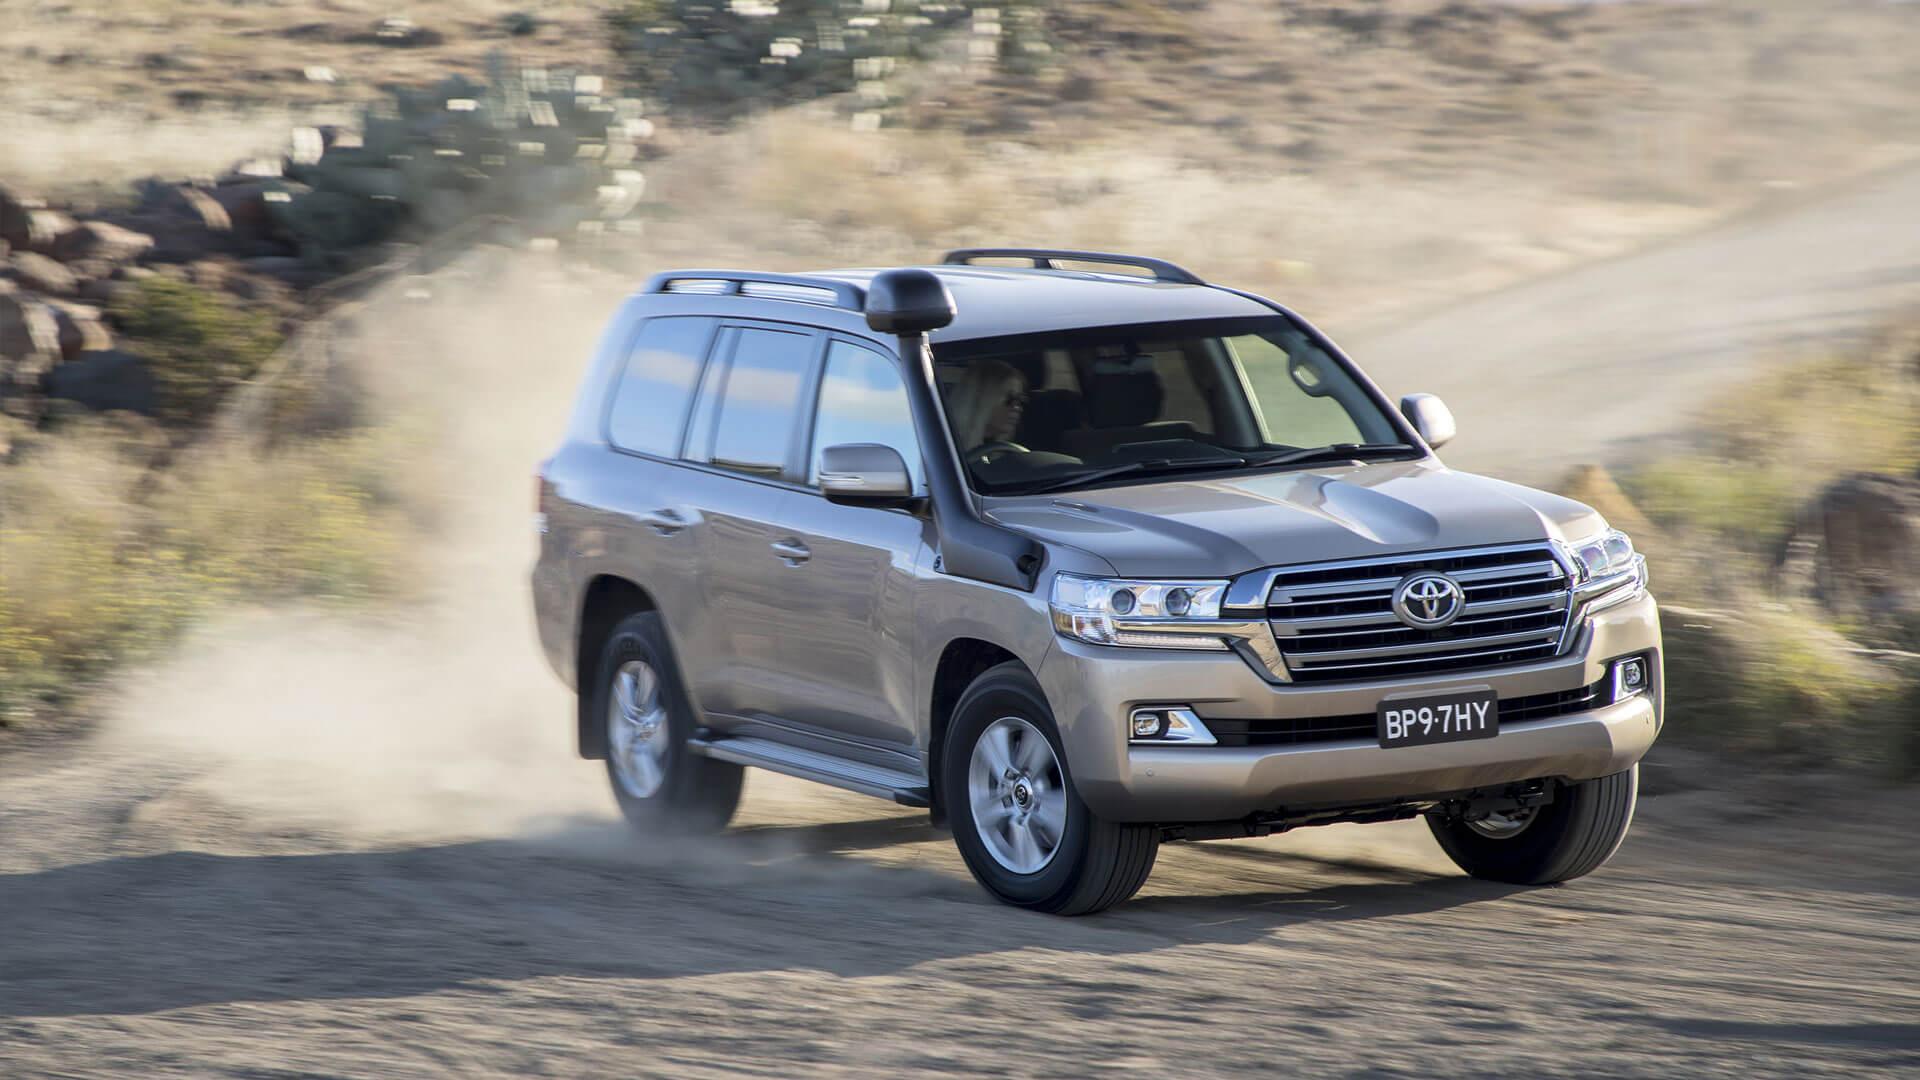 Kekurangan Toyota Lc 200 Review